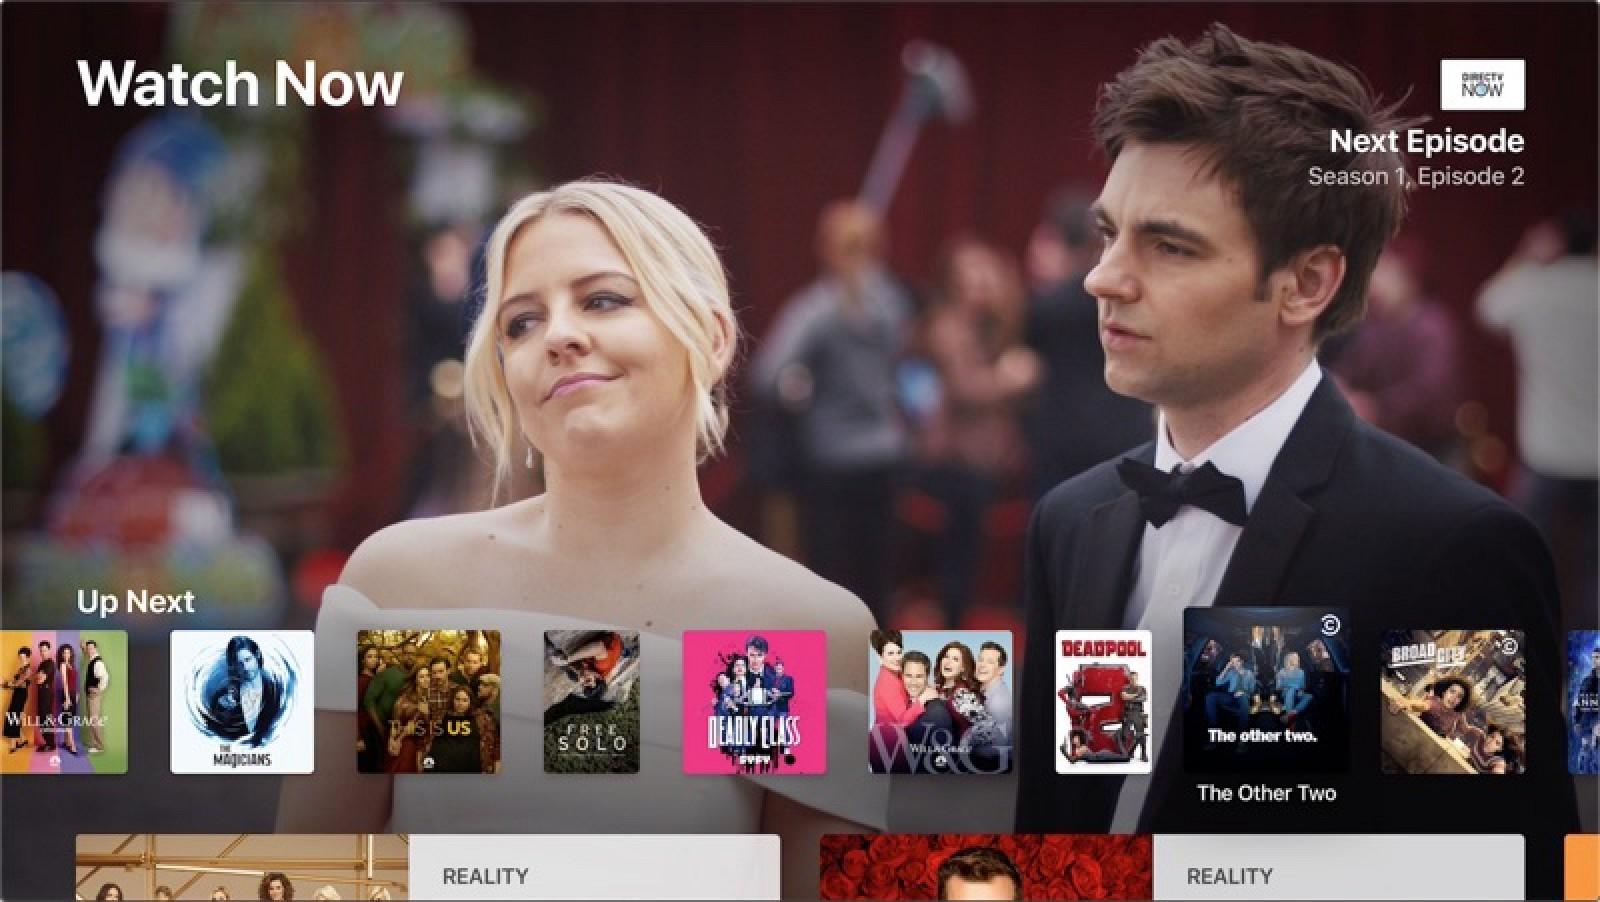 DirecTV Now Gains Apple TV App Integration